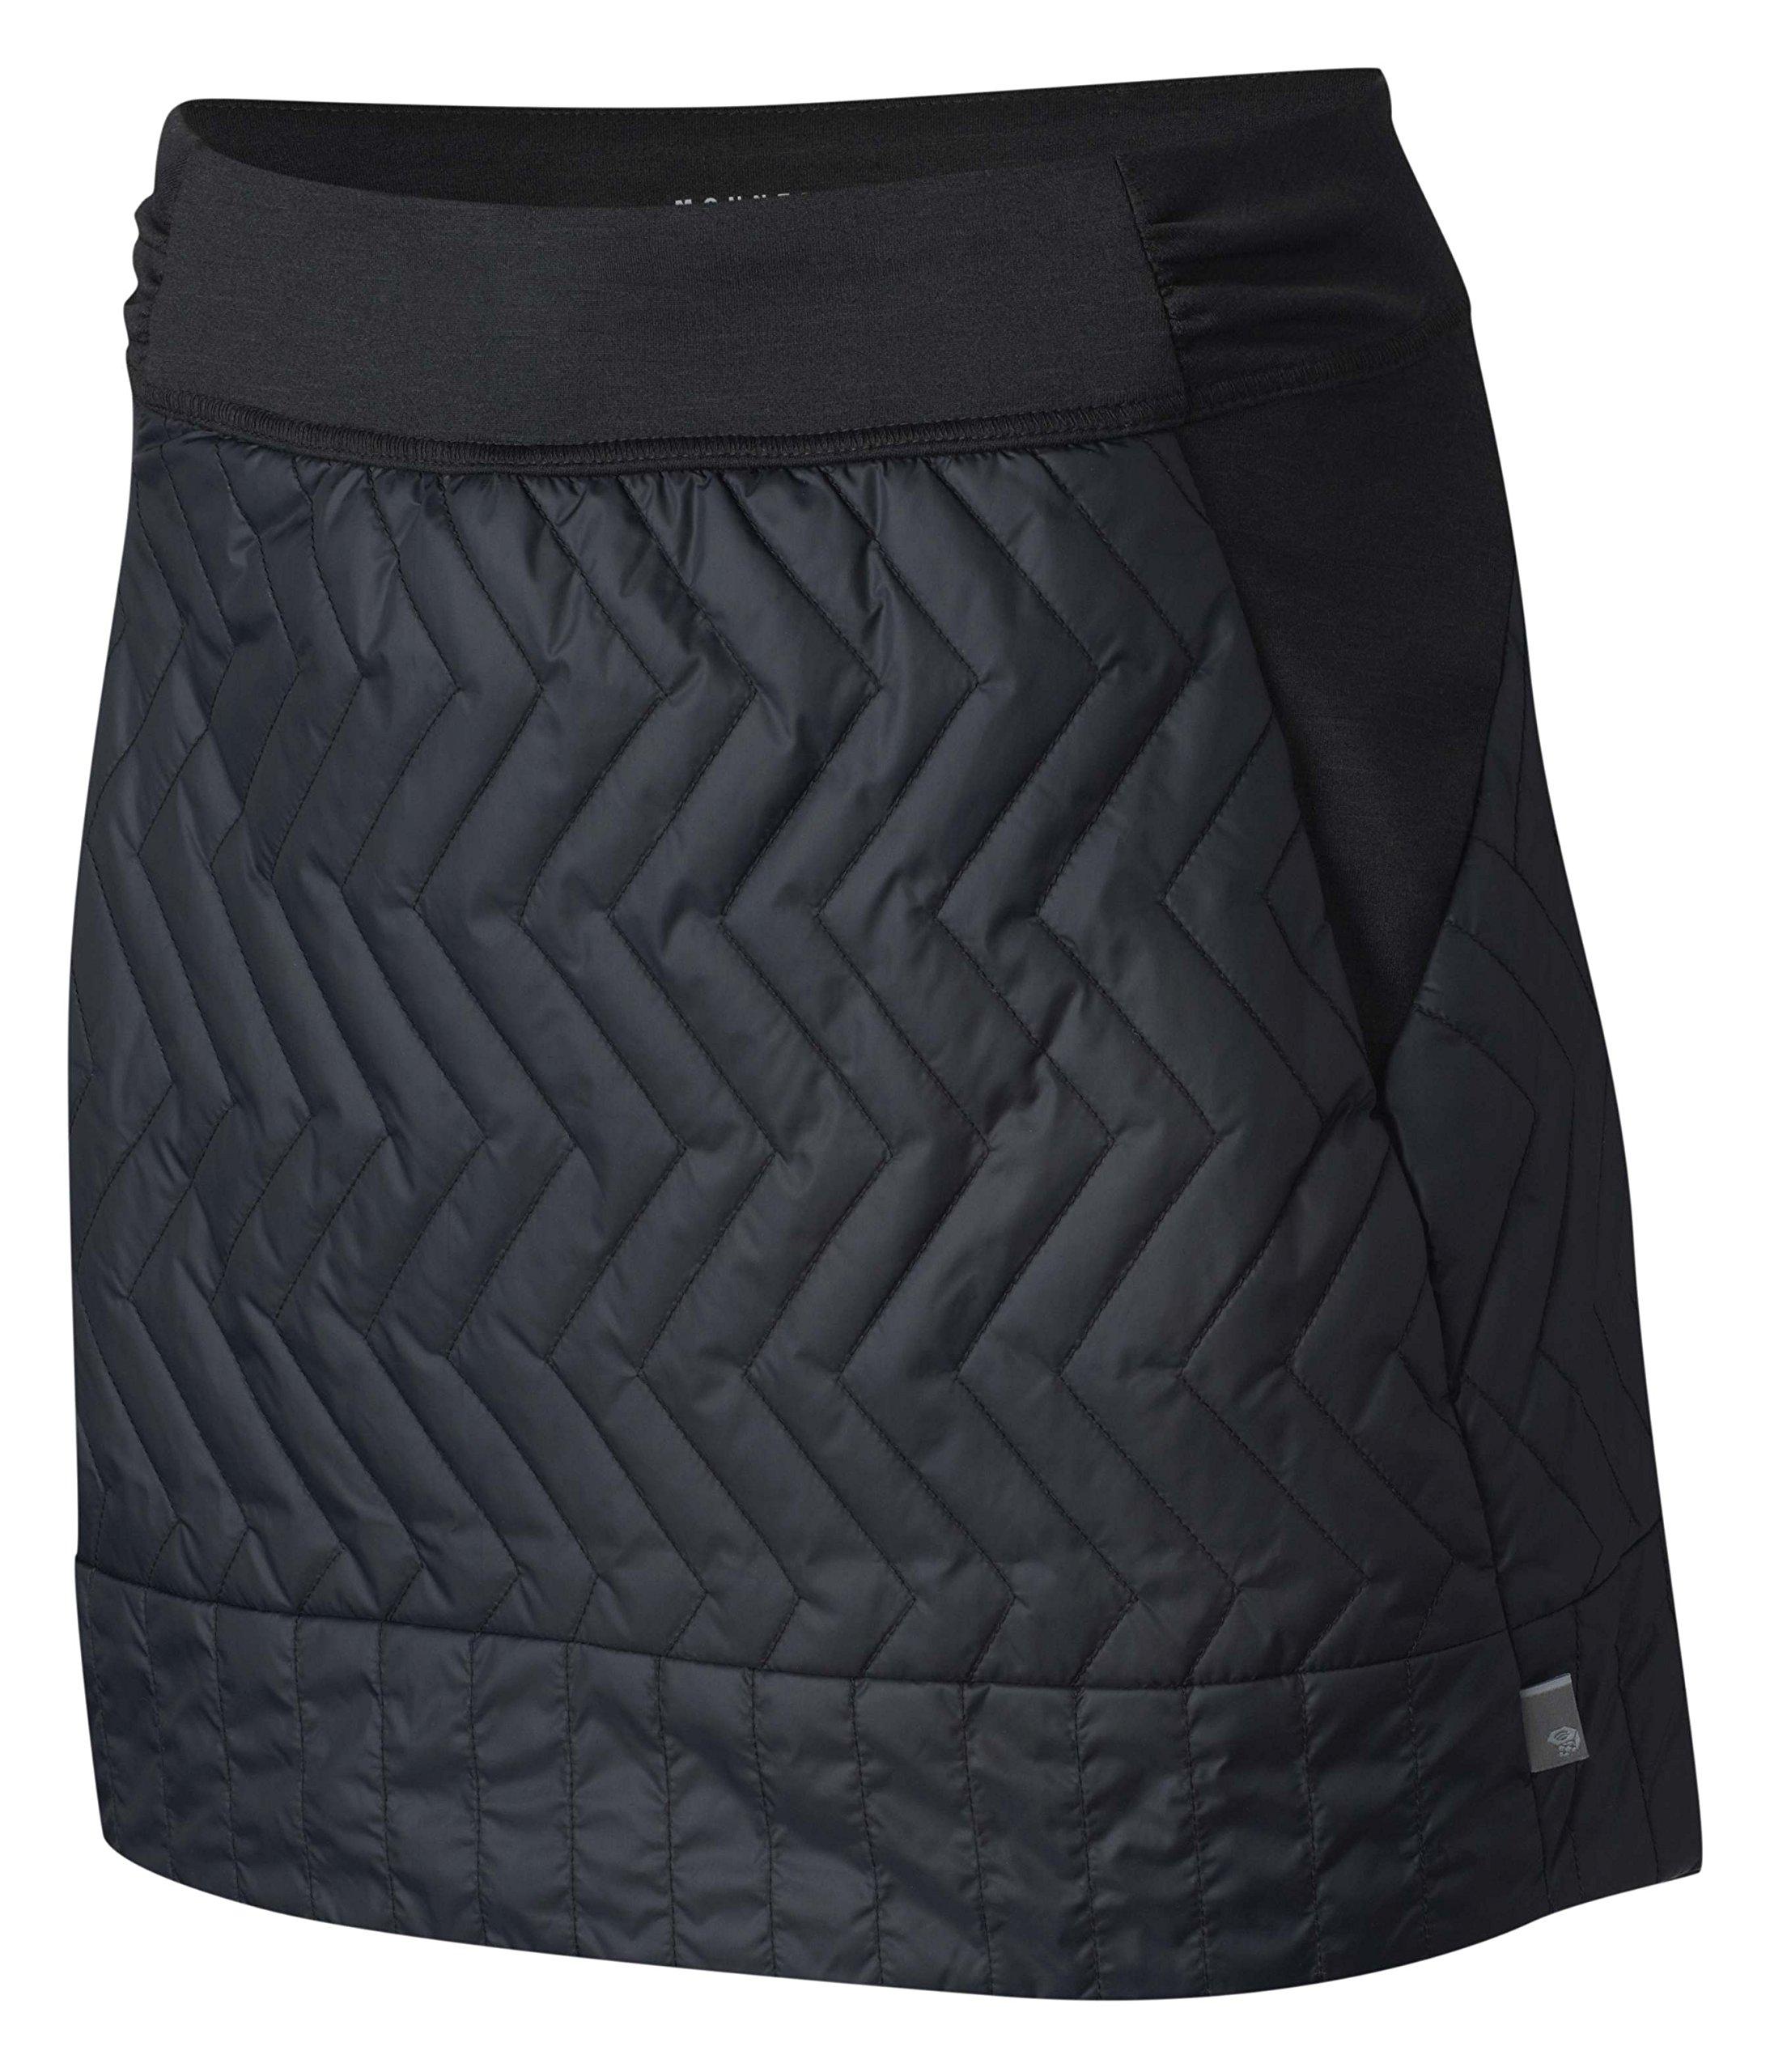 Mountain Hardwear Women's Trekkin¿ Insulated Mini Skirt Black X-Large by Mountain Hardwear